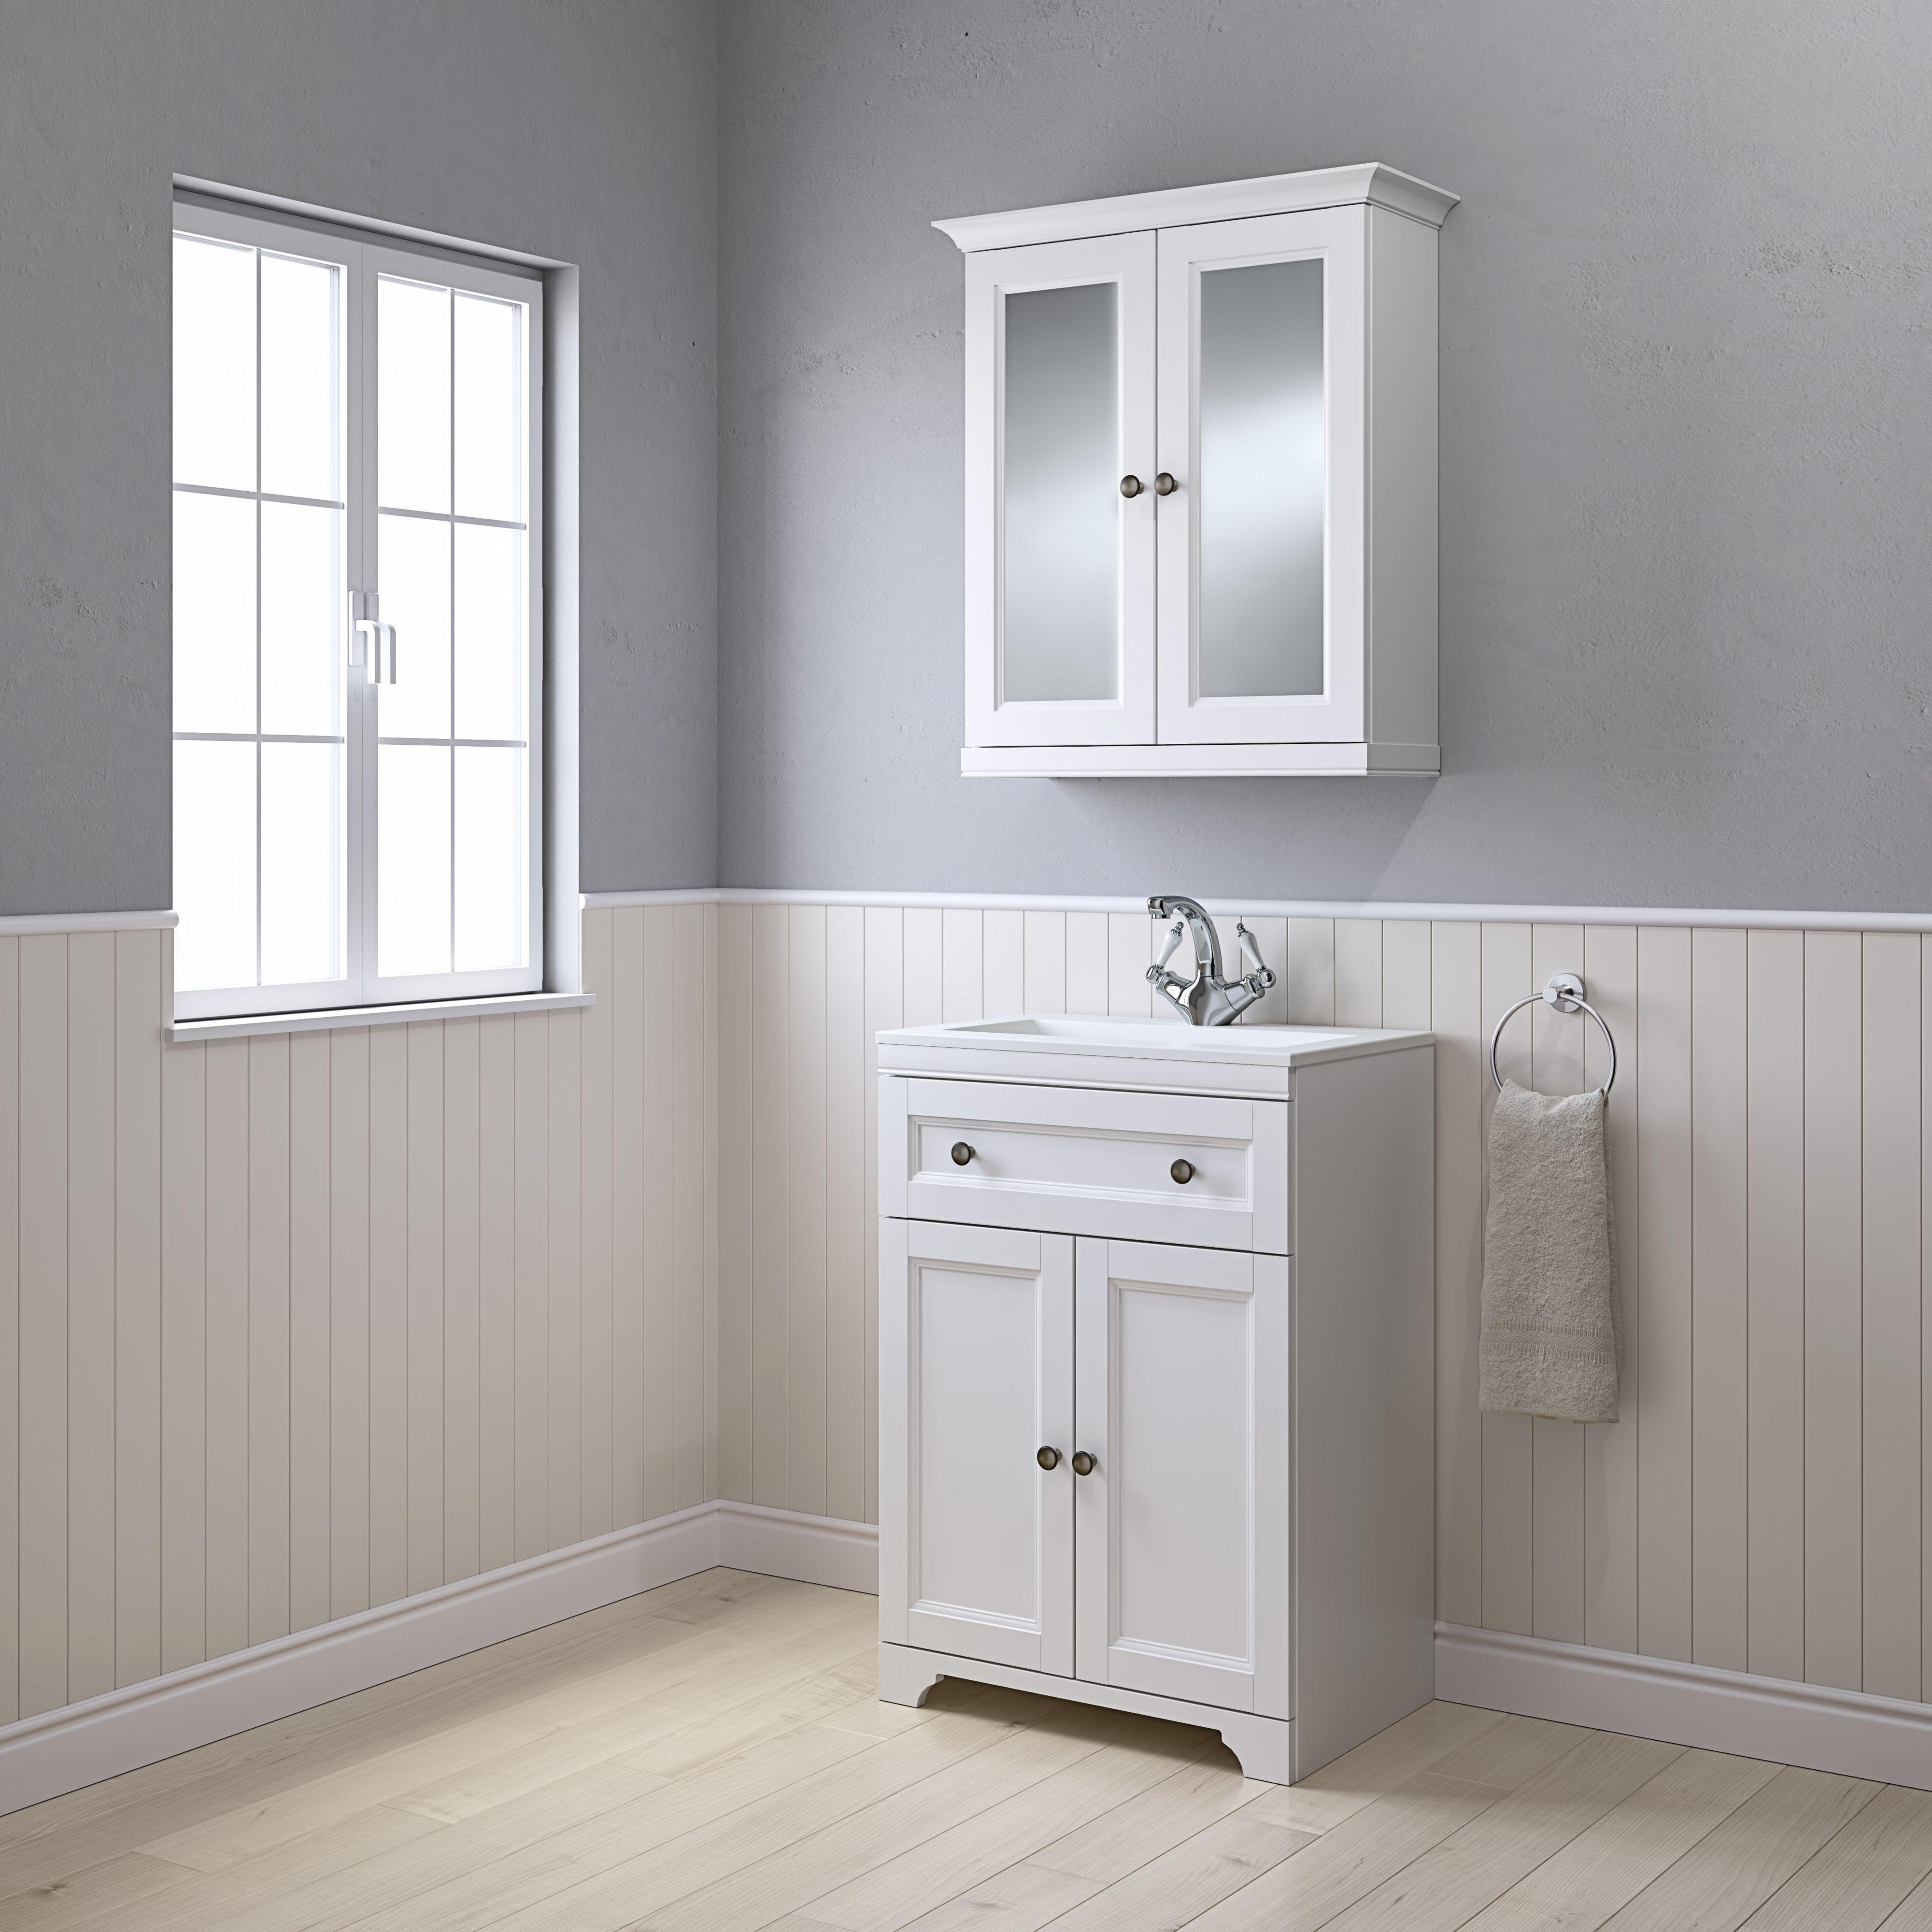 Traditional bathroom ideas Ideas Advice DIY at BQ